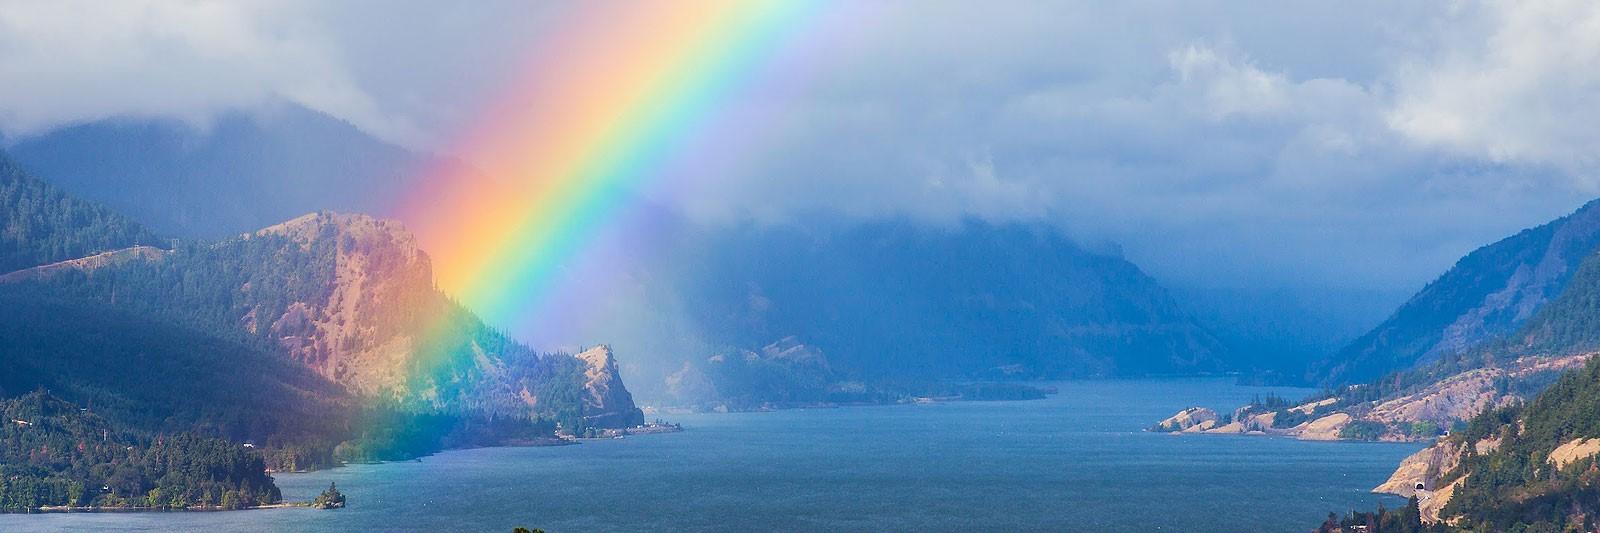 banner_images_rainbow.jpg